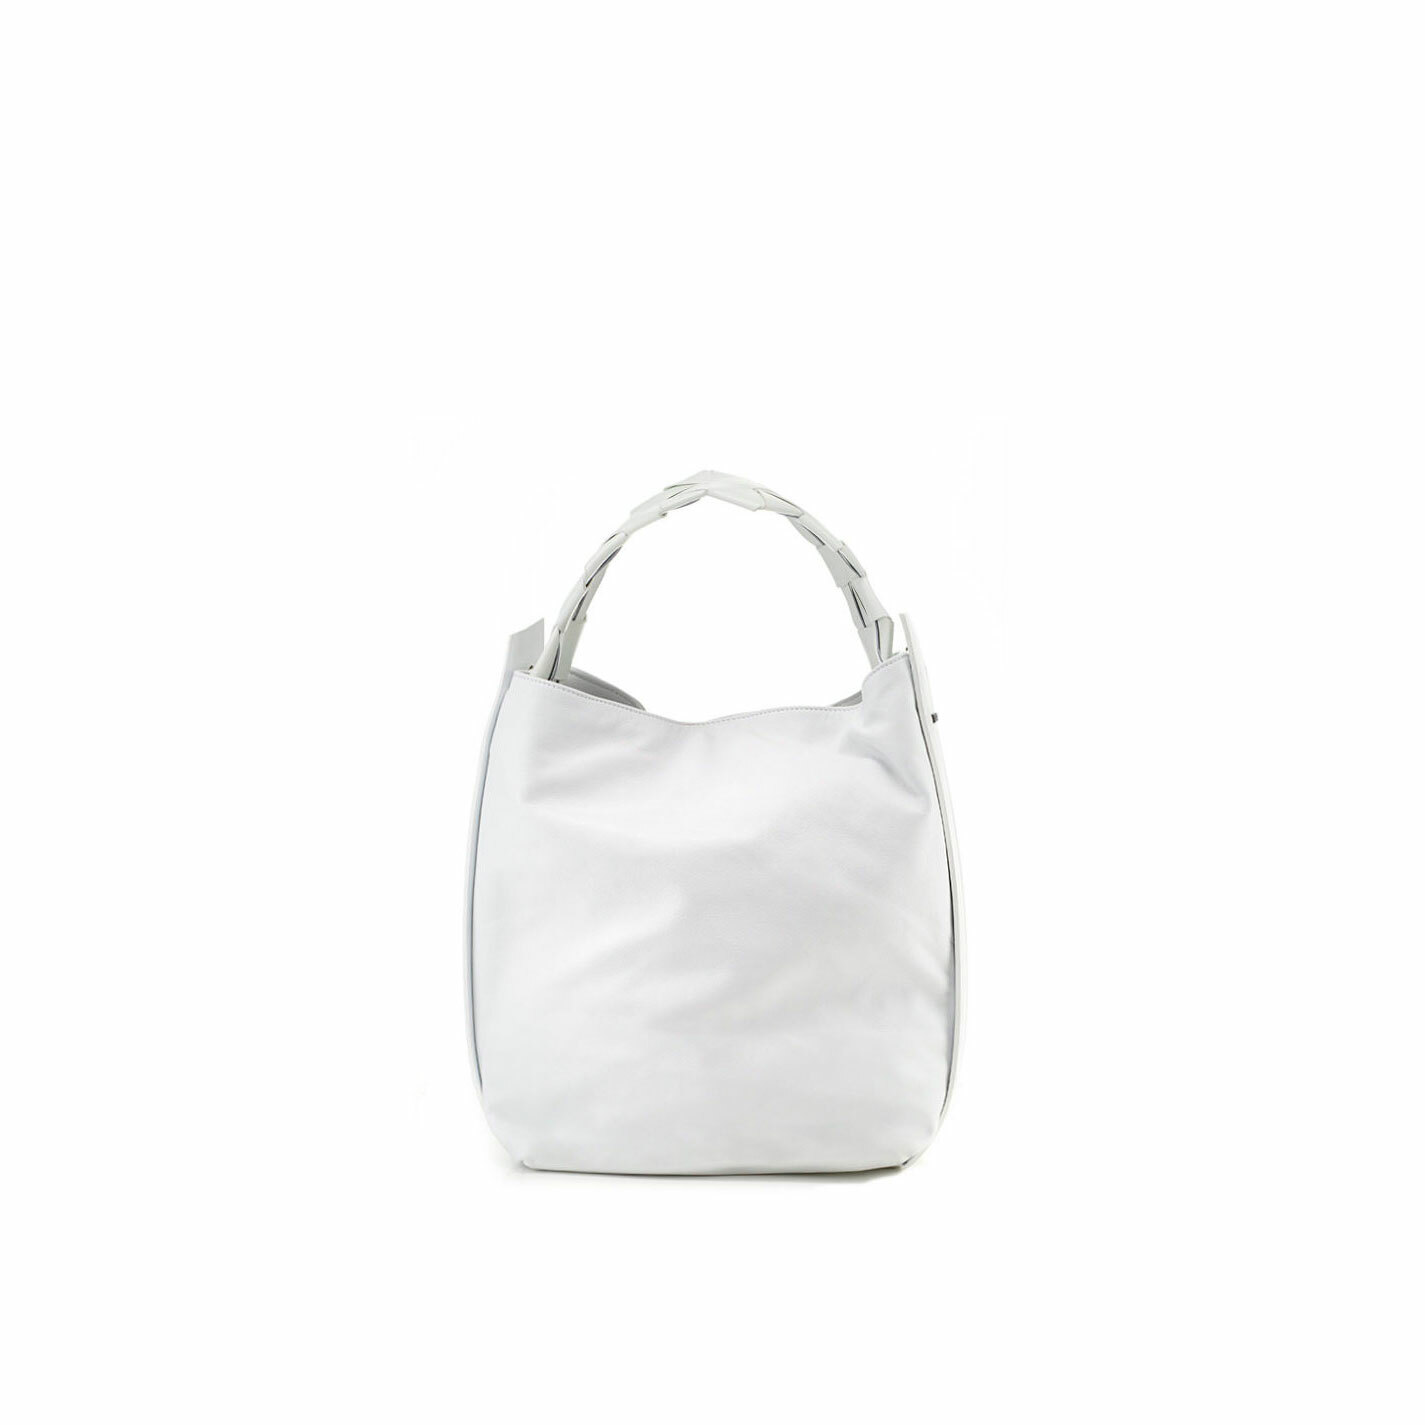 Vivian<br>Shopper bianca